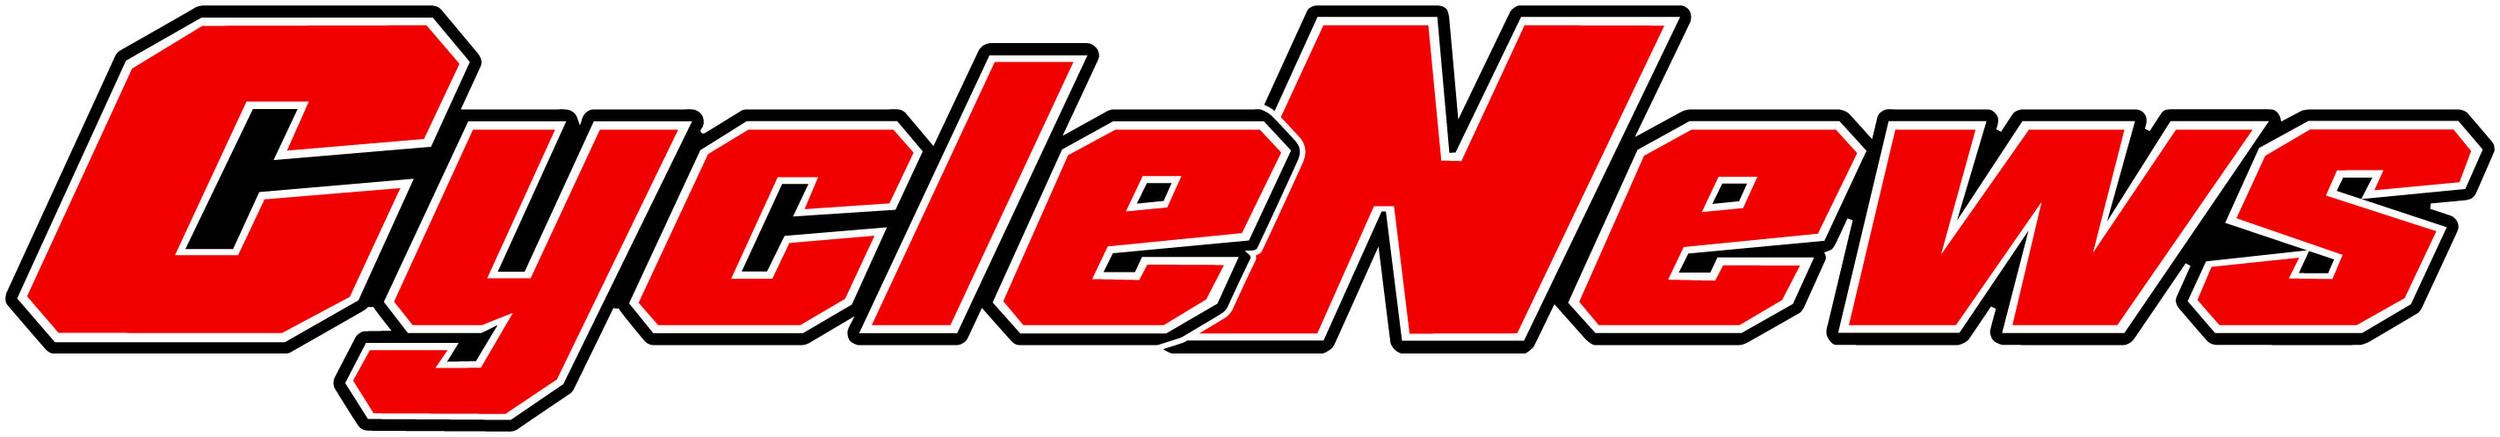 Cycle News Logo_RED.jpg